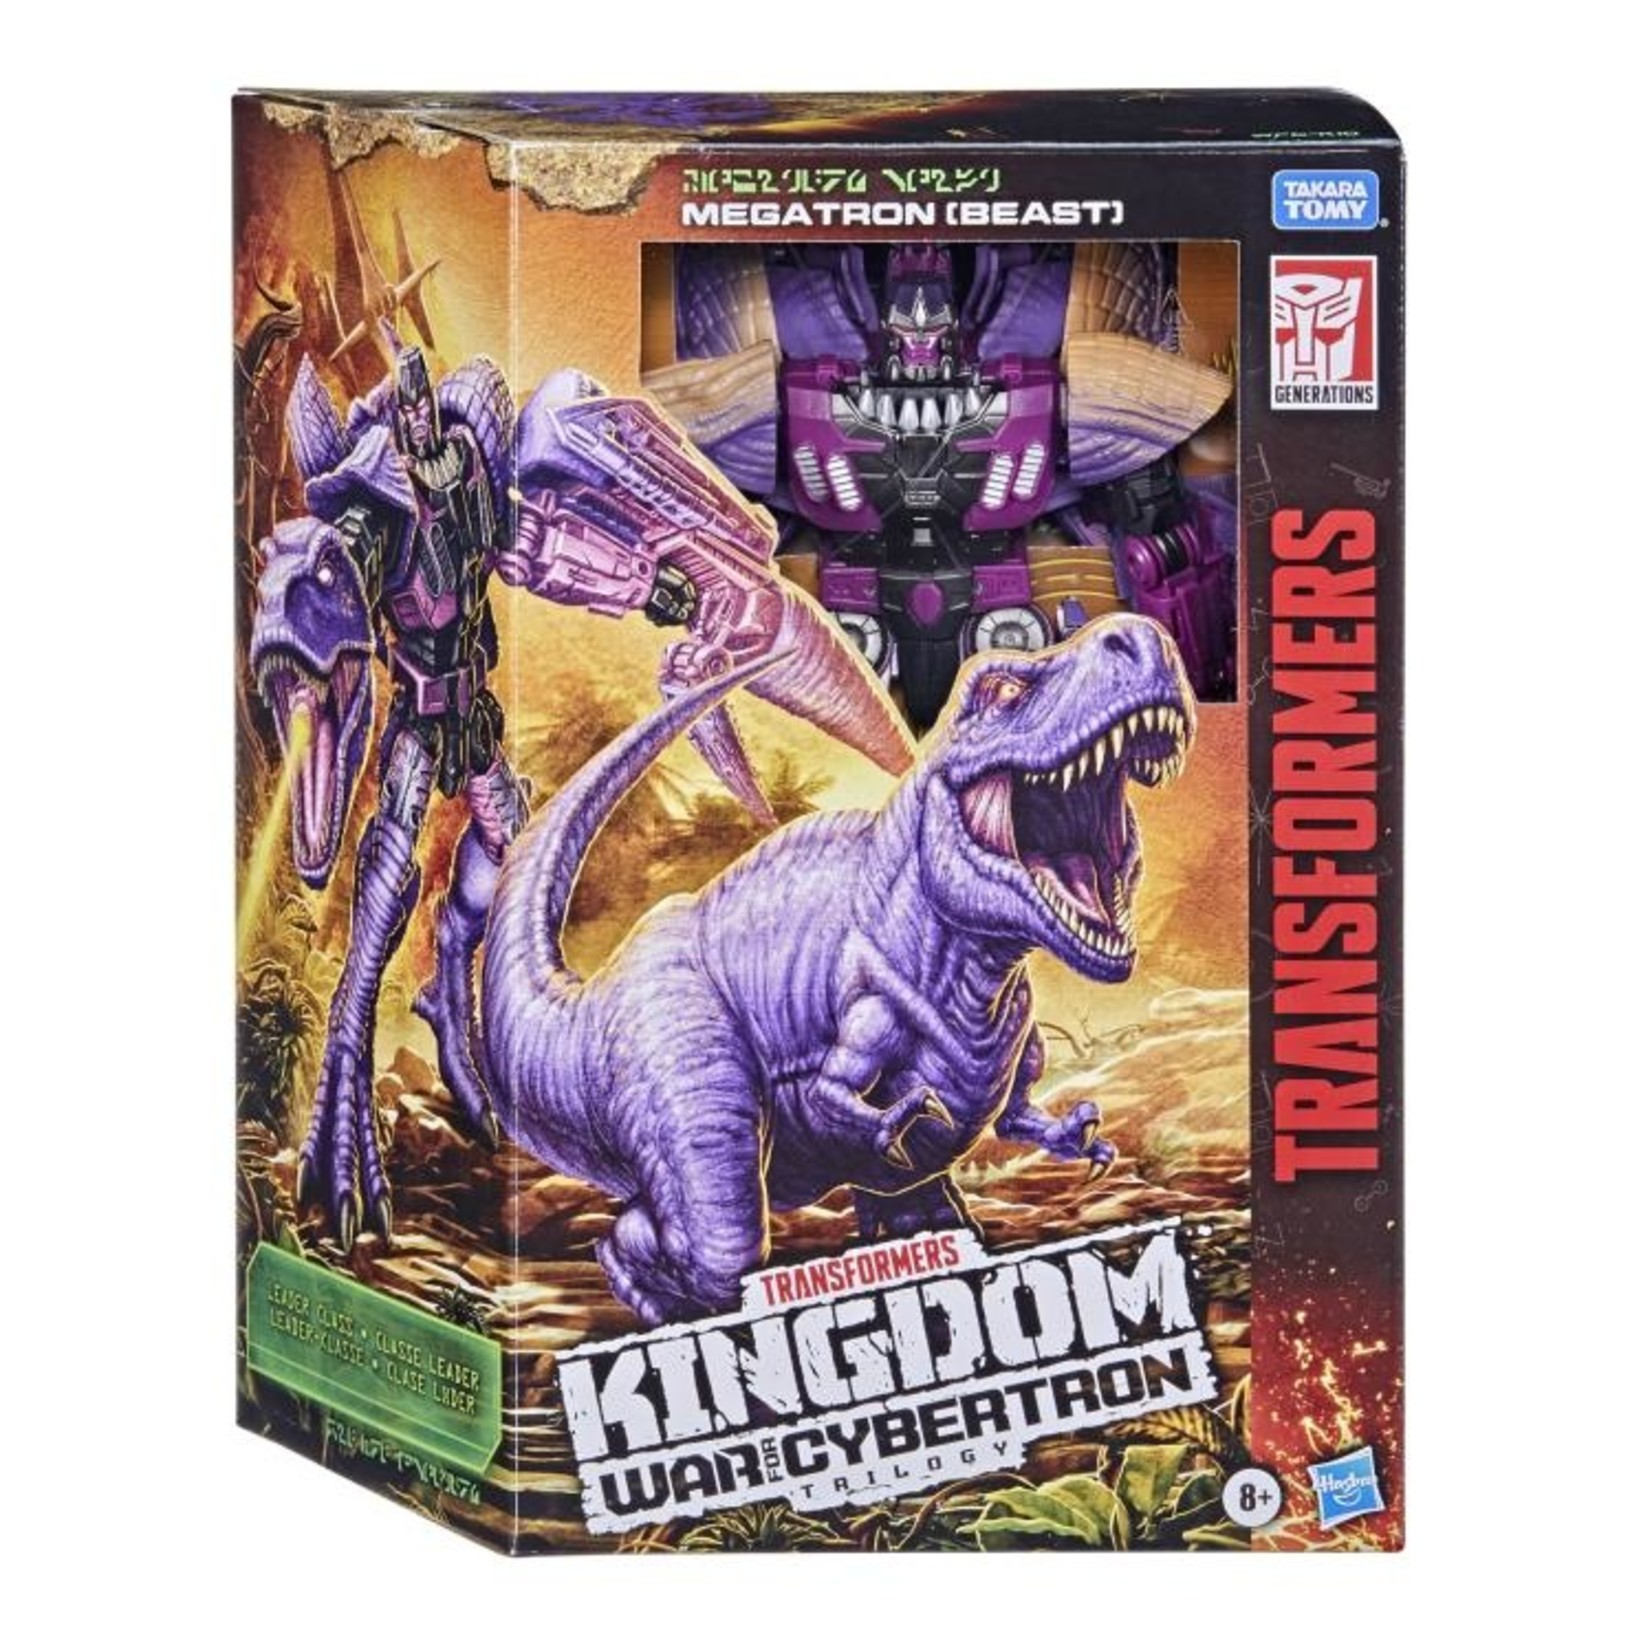 Hasbro Transformers Toys Generations War for Cybertron: Kingdom Leader Trex Megatron Beast